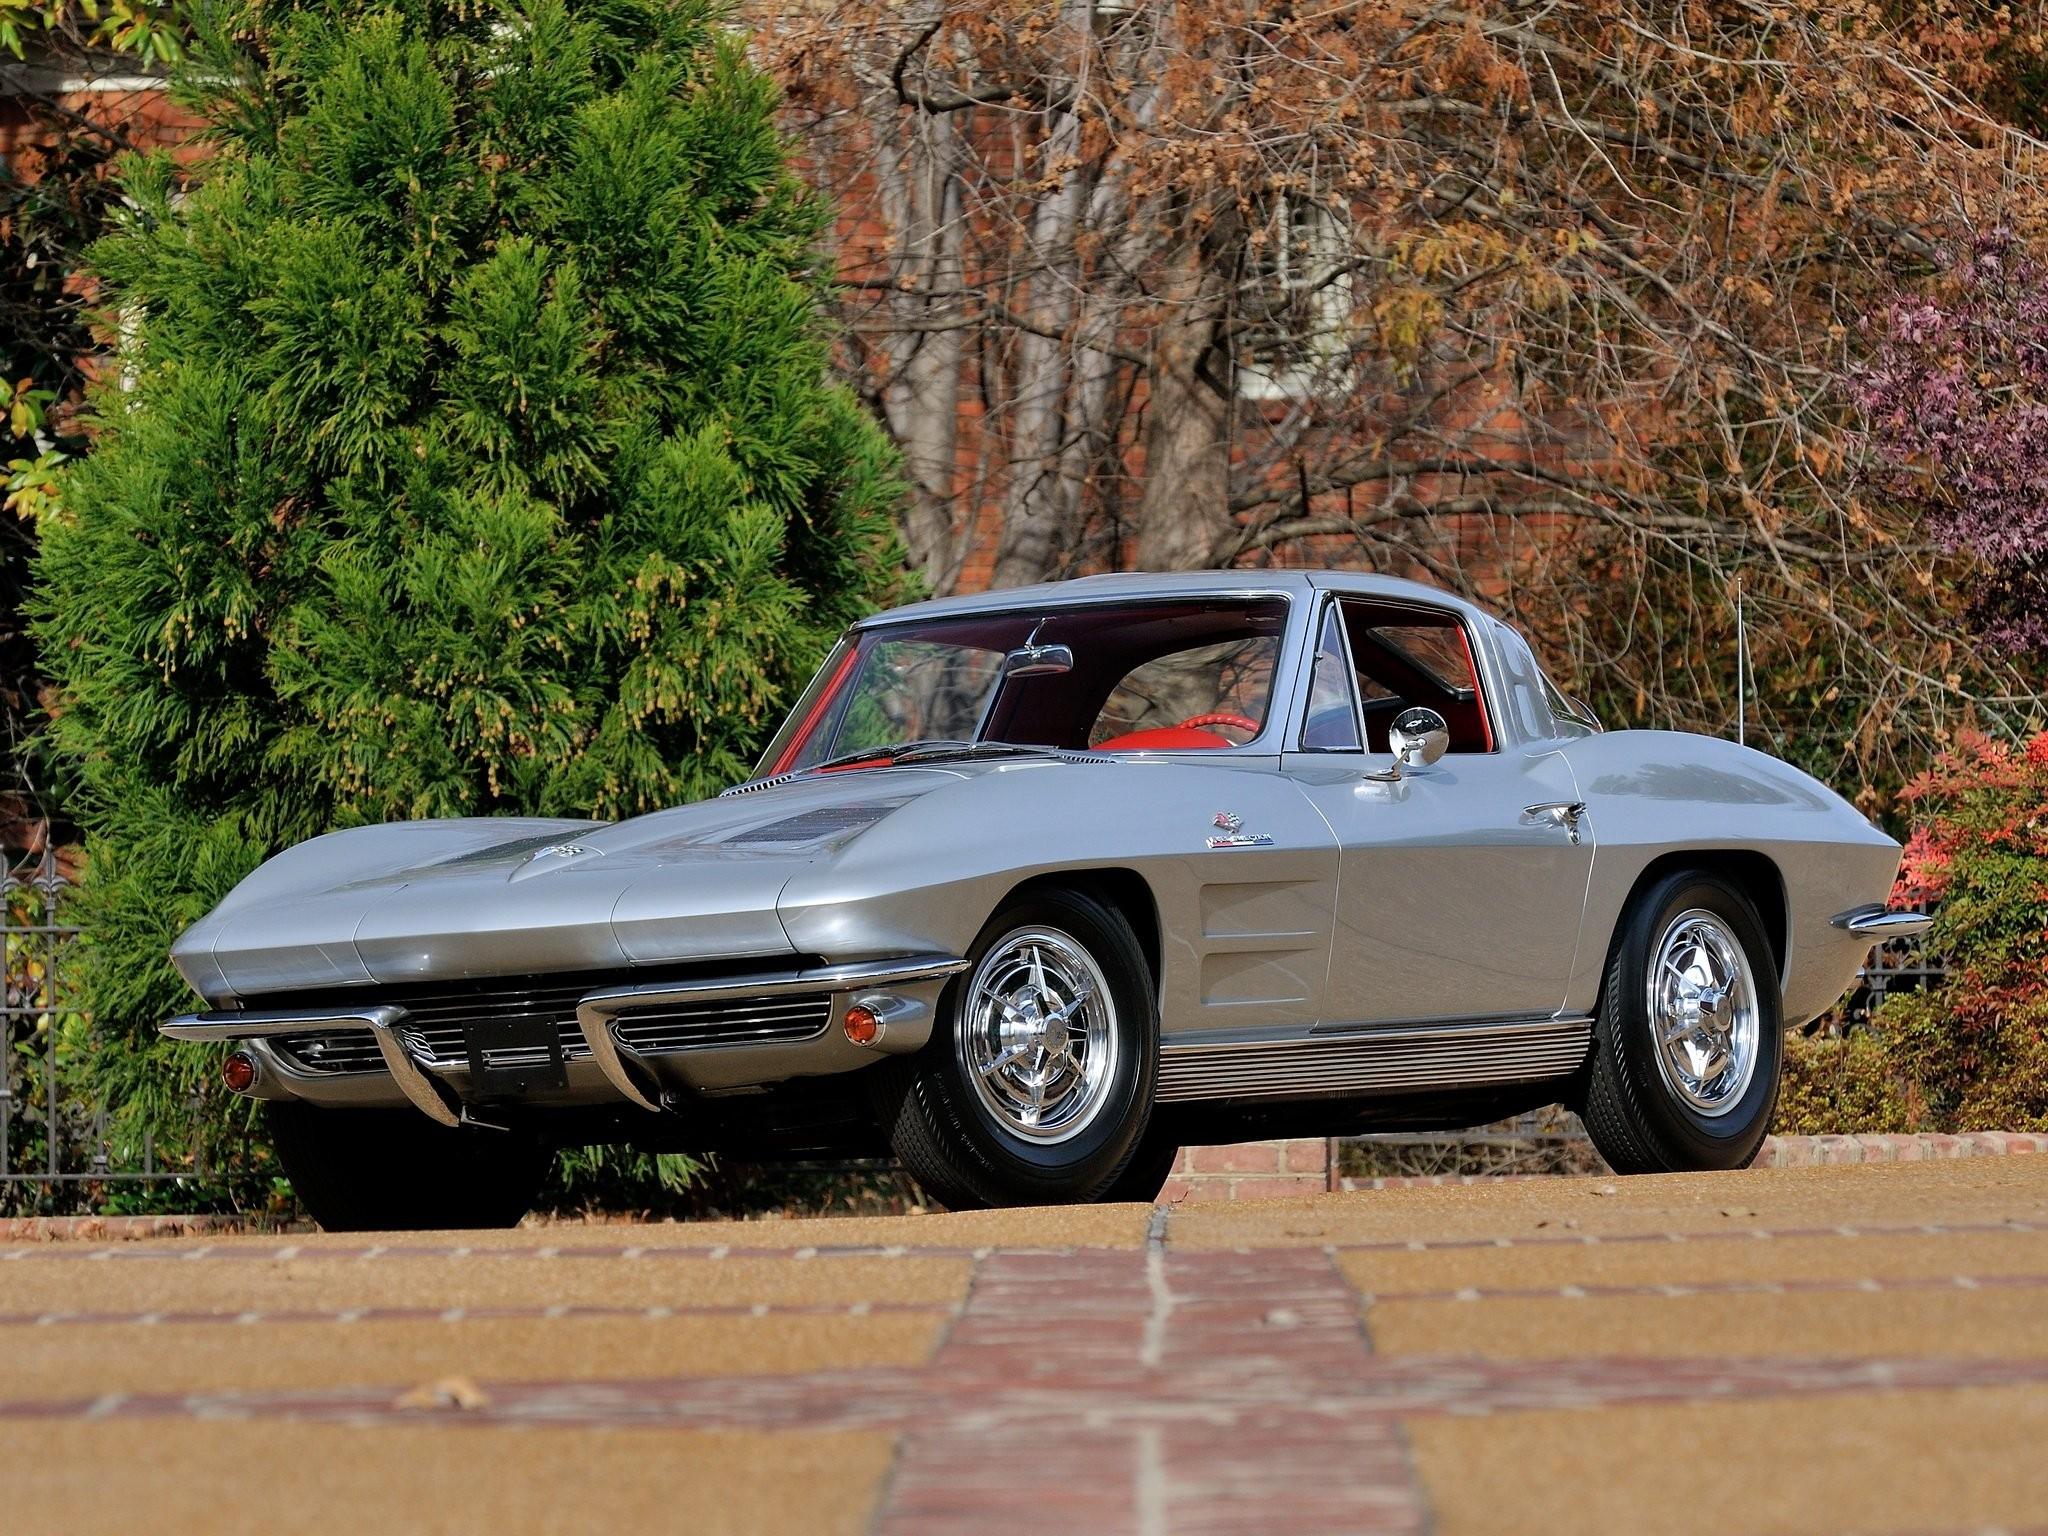 Chevrolet Corvette C2 Sting Ray photo